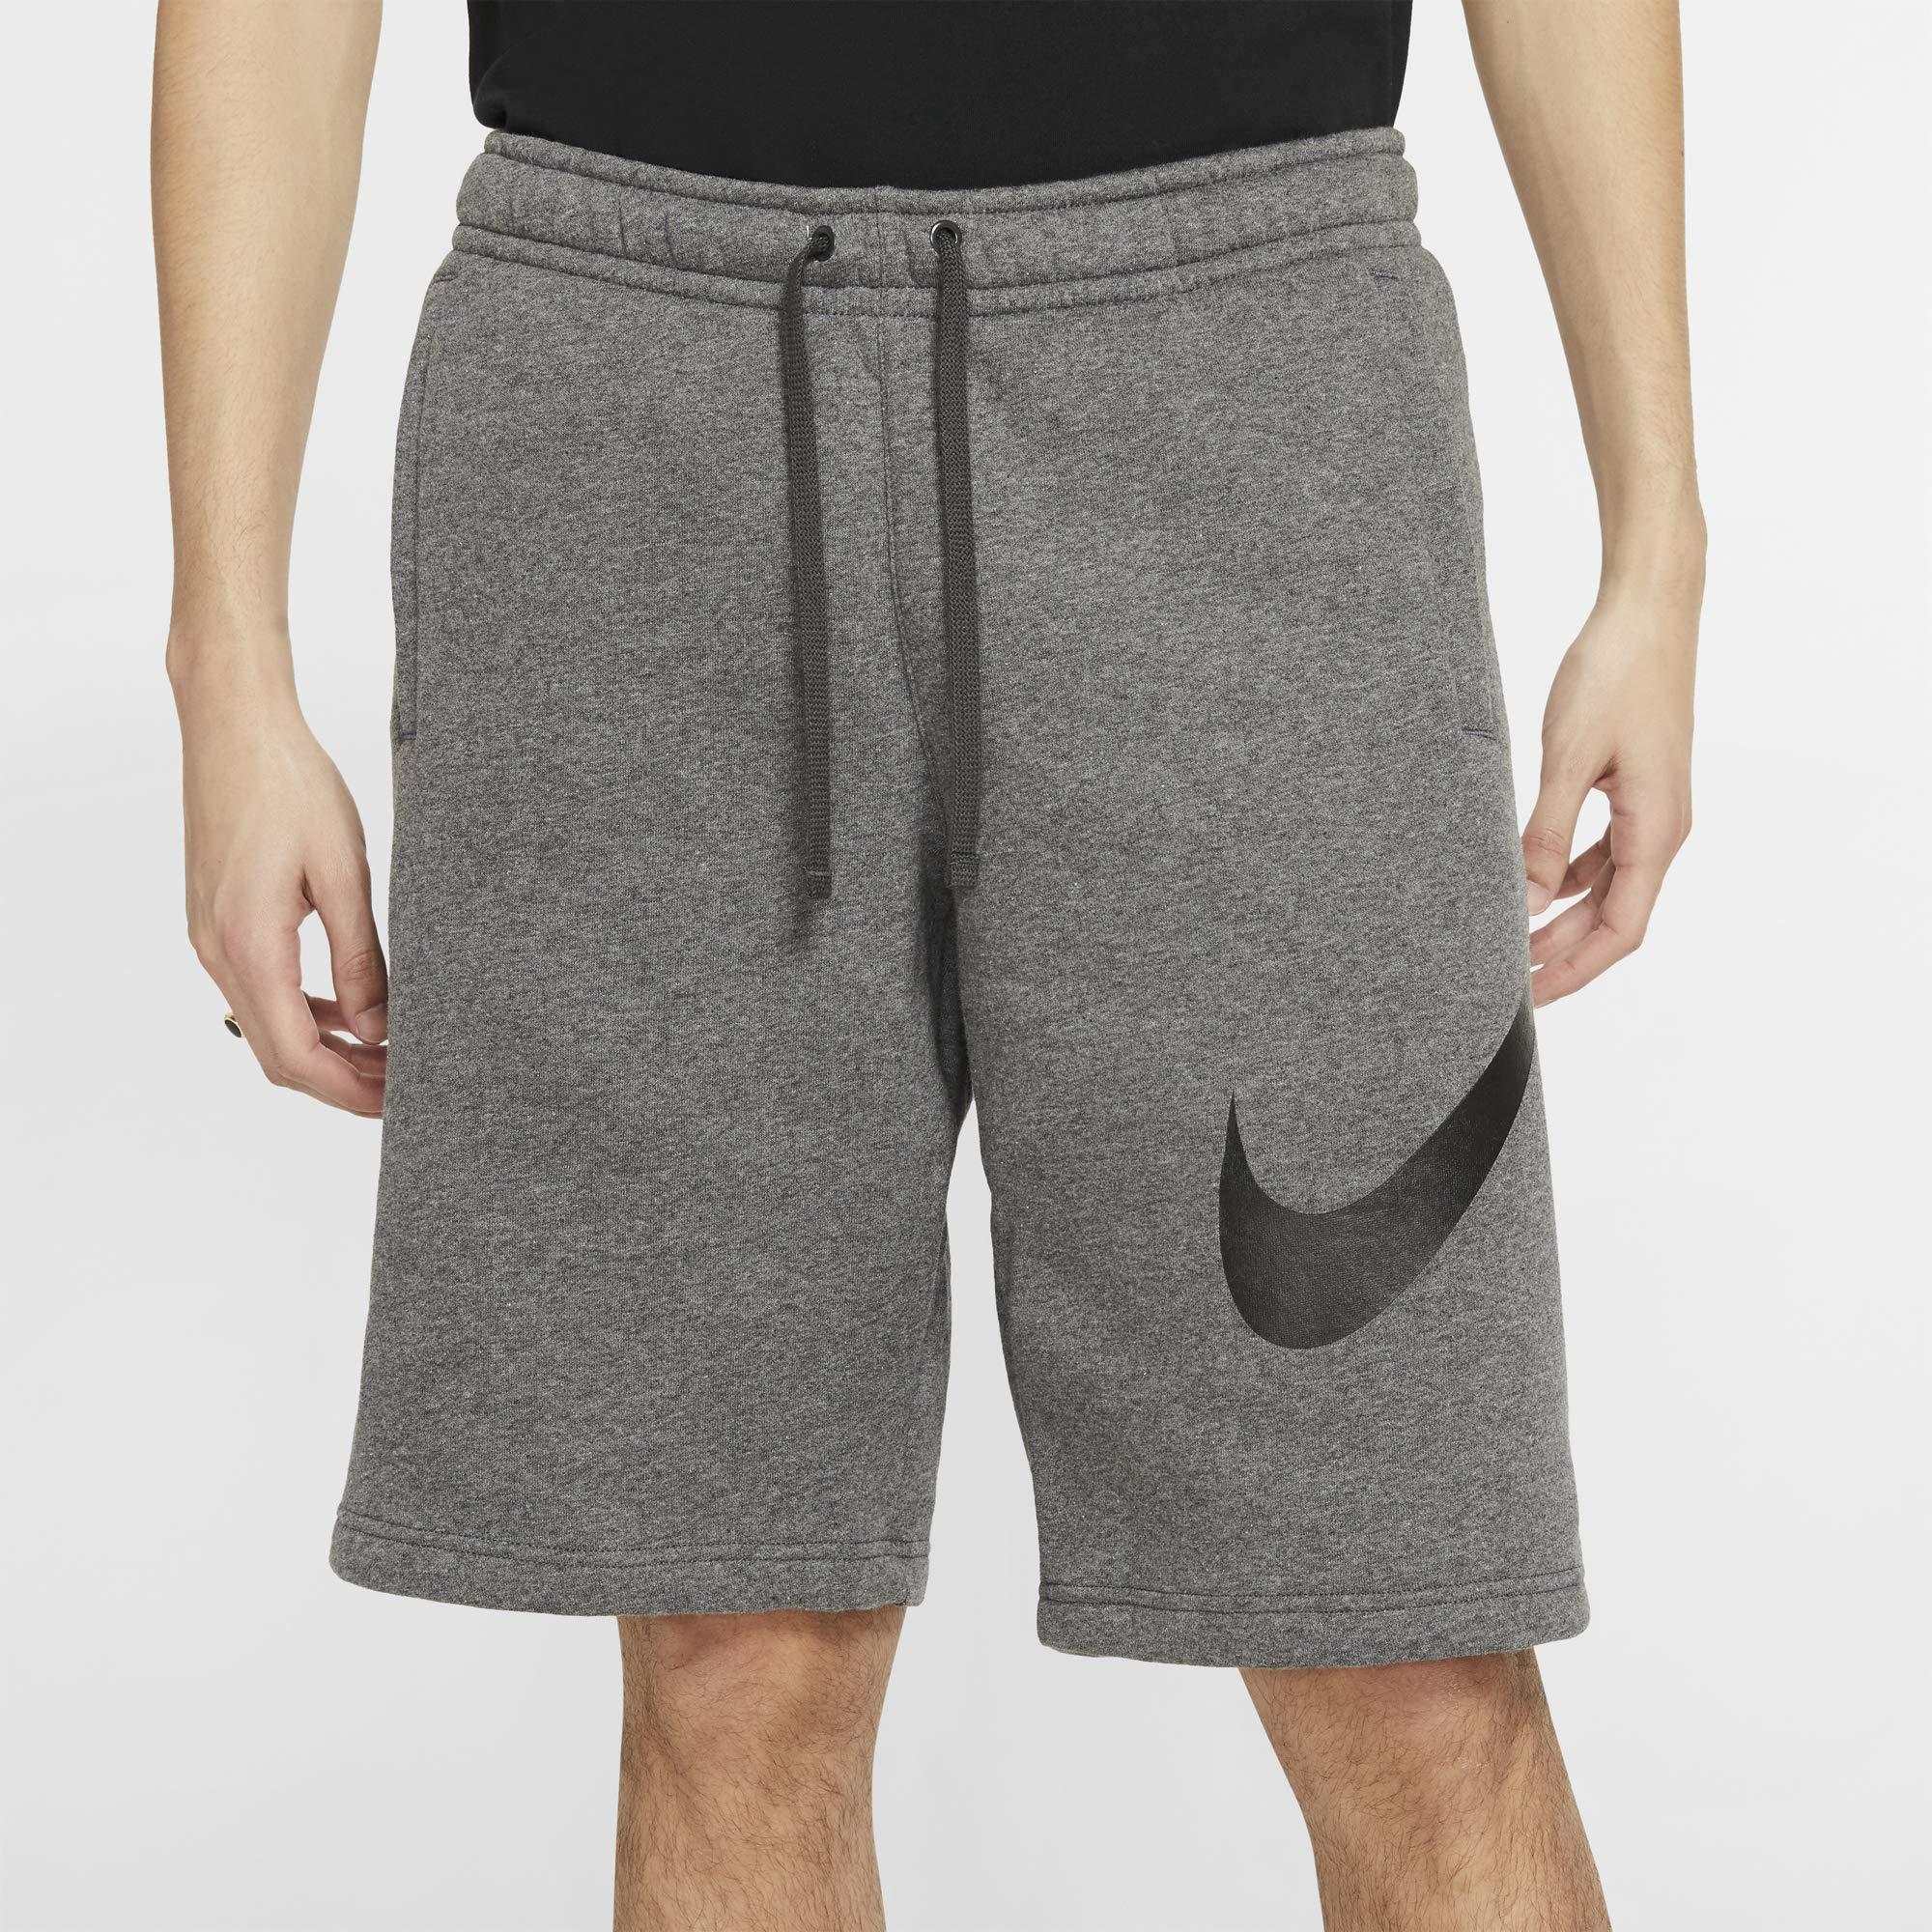 NIKE Sportswear Shorts Charcoal Heather